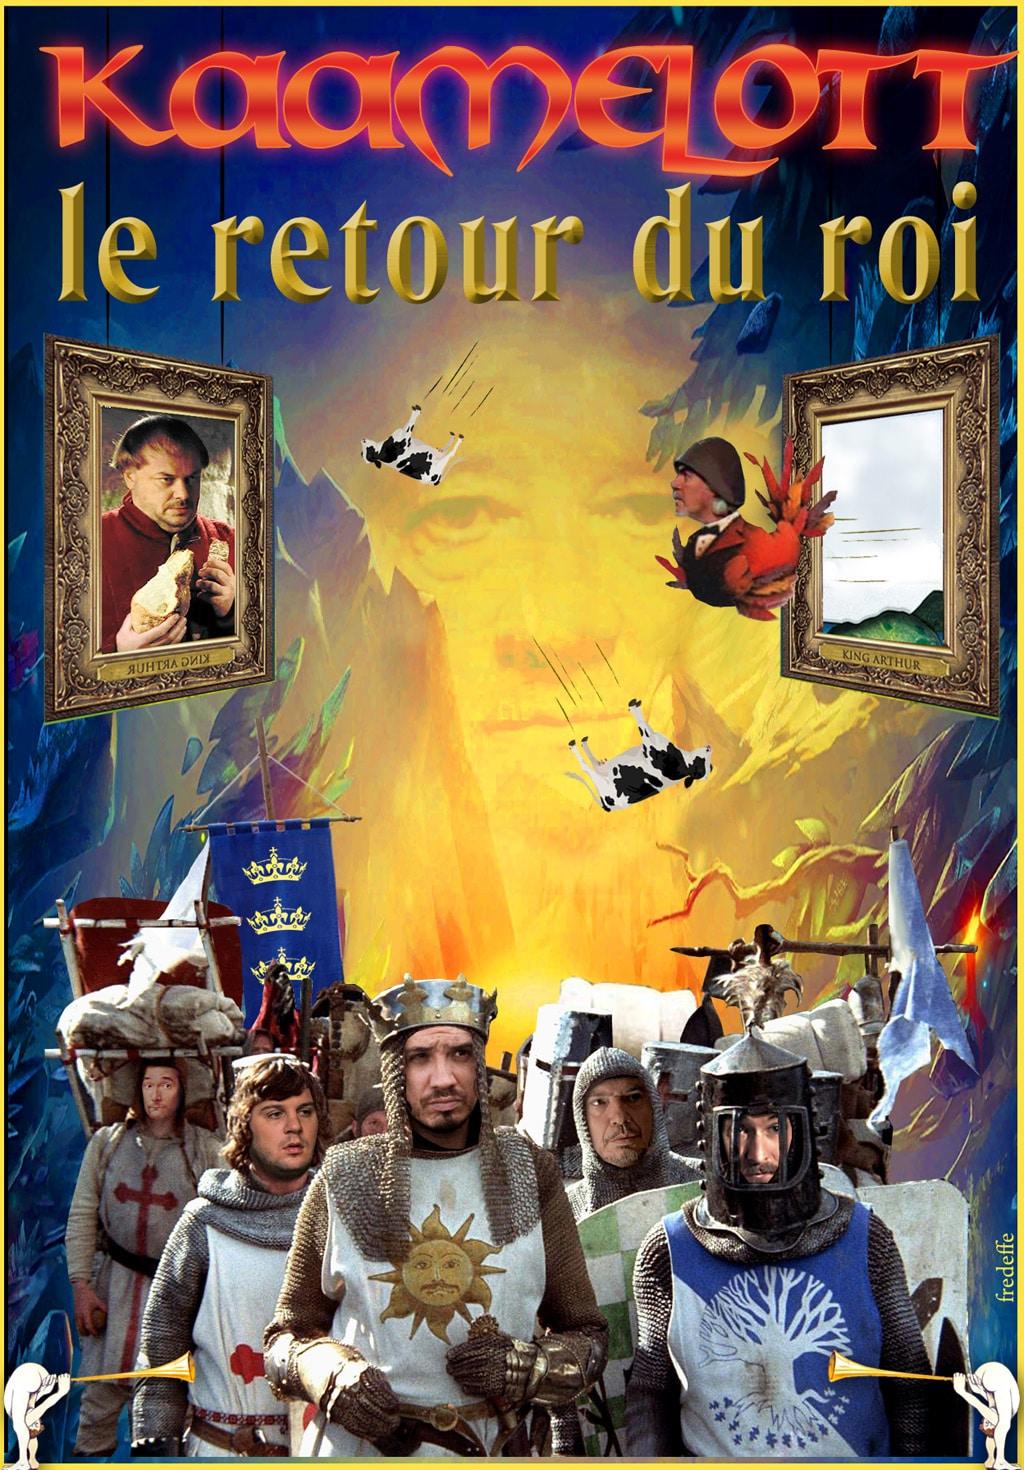 kaamelott_holy_grail_saint_graal_humour_affiche_cinema_detournement_alexandre_astier_hommage_Monty_Python